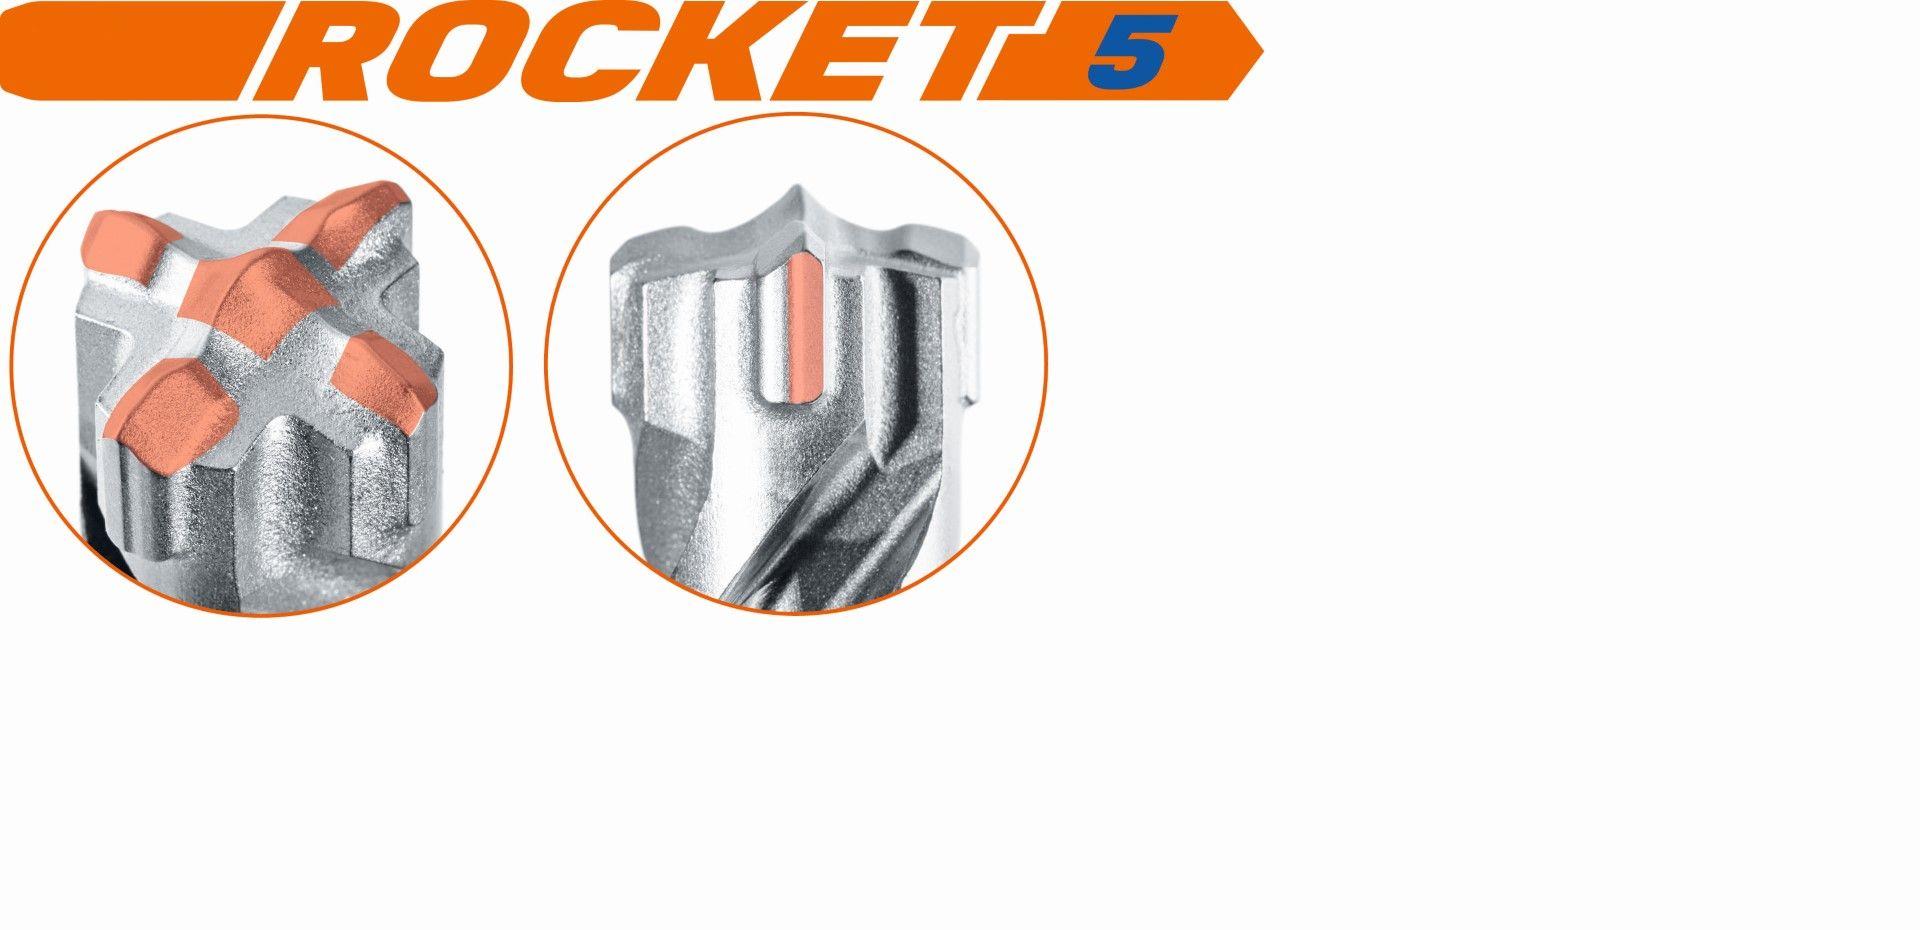 Slika BORER Rocket 5 SDS-plus 6,5x210mm 4-kraka